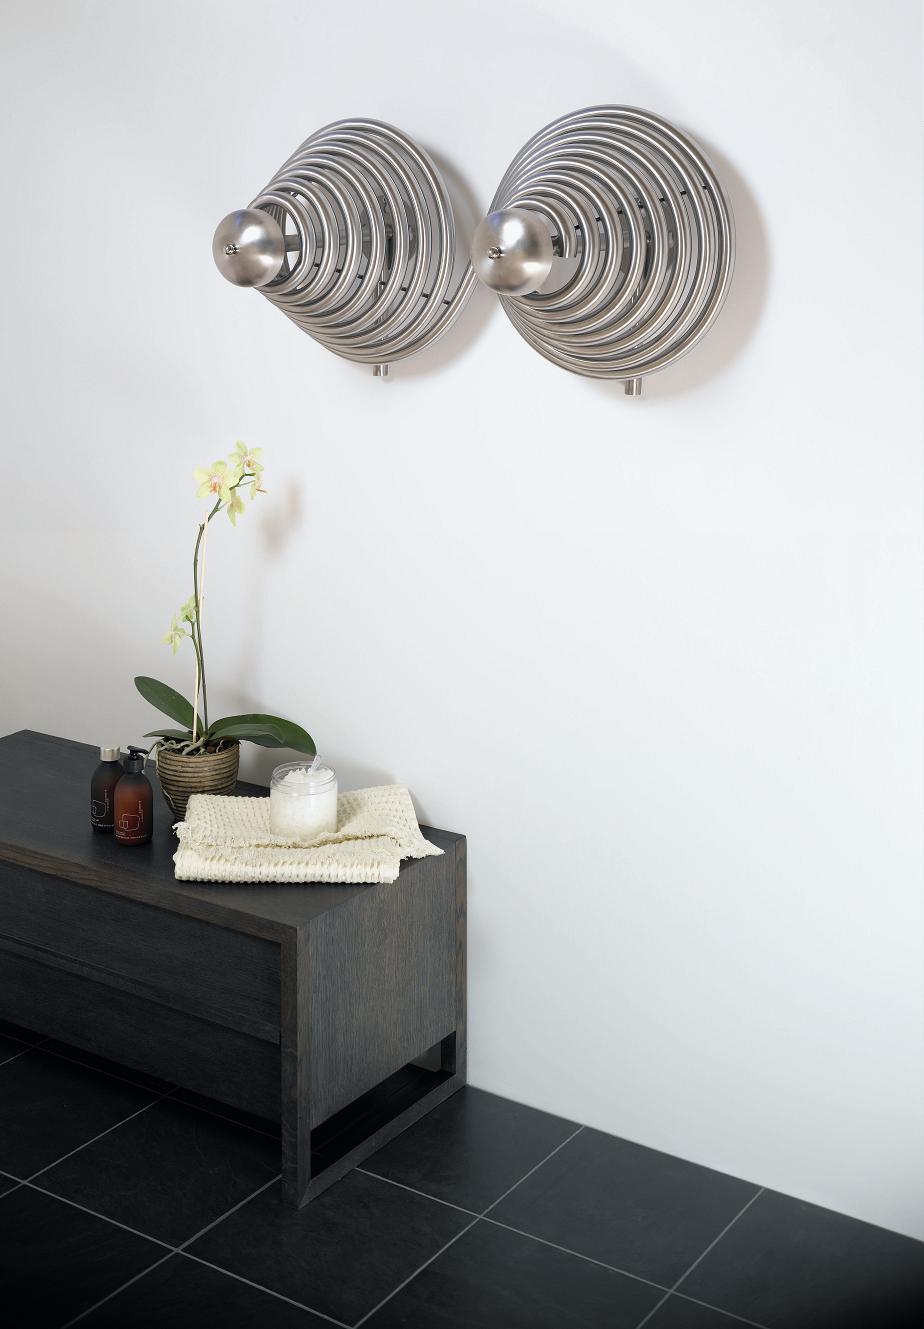 Aeon Pitacs Madonna Design Hot Water Radiator